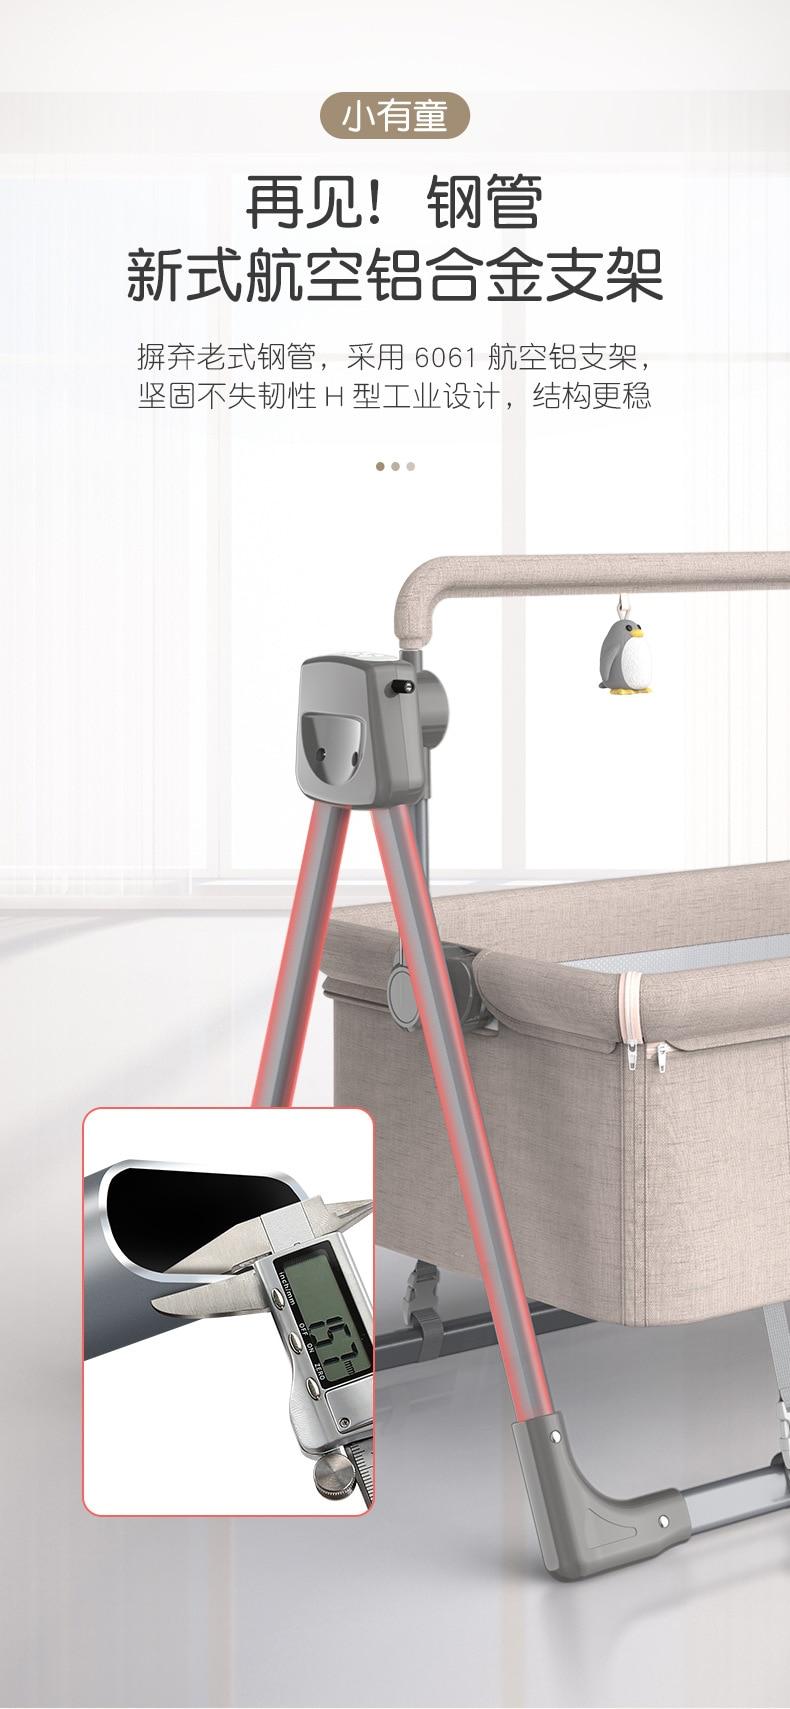 H4d7dc770a5d54f5e848c8e60cc580d058 2020 Baby Intelligent Electric Cradle Rocker Multifunctional Newborn Intelligent Rocking Chair Send Storage Bag and Mosquito Net